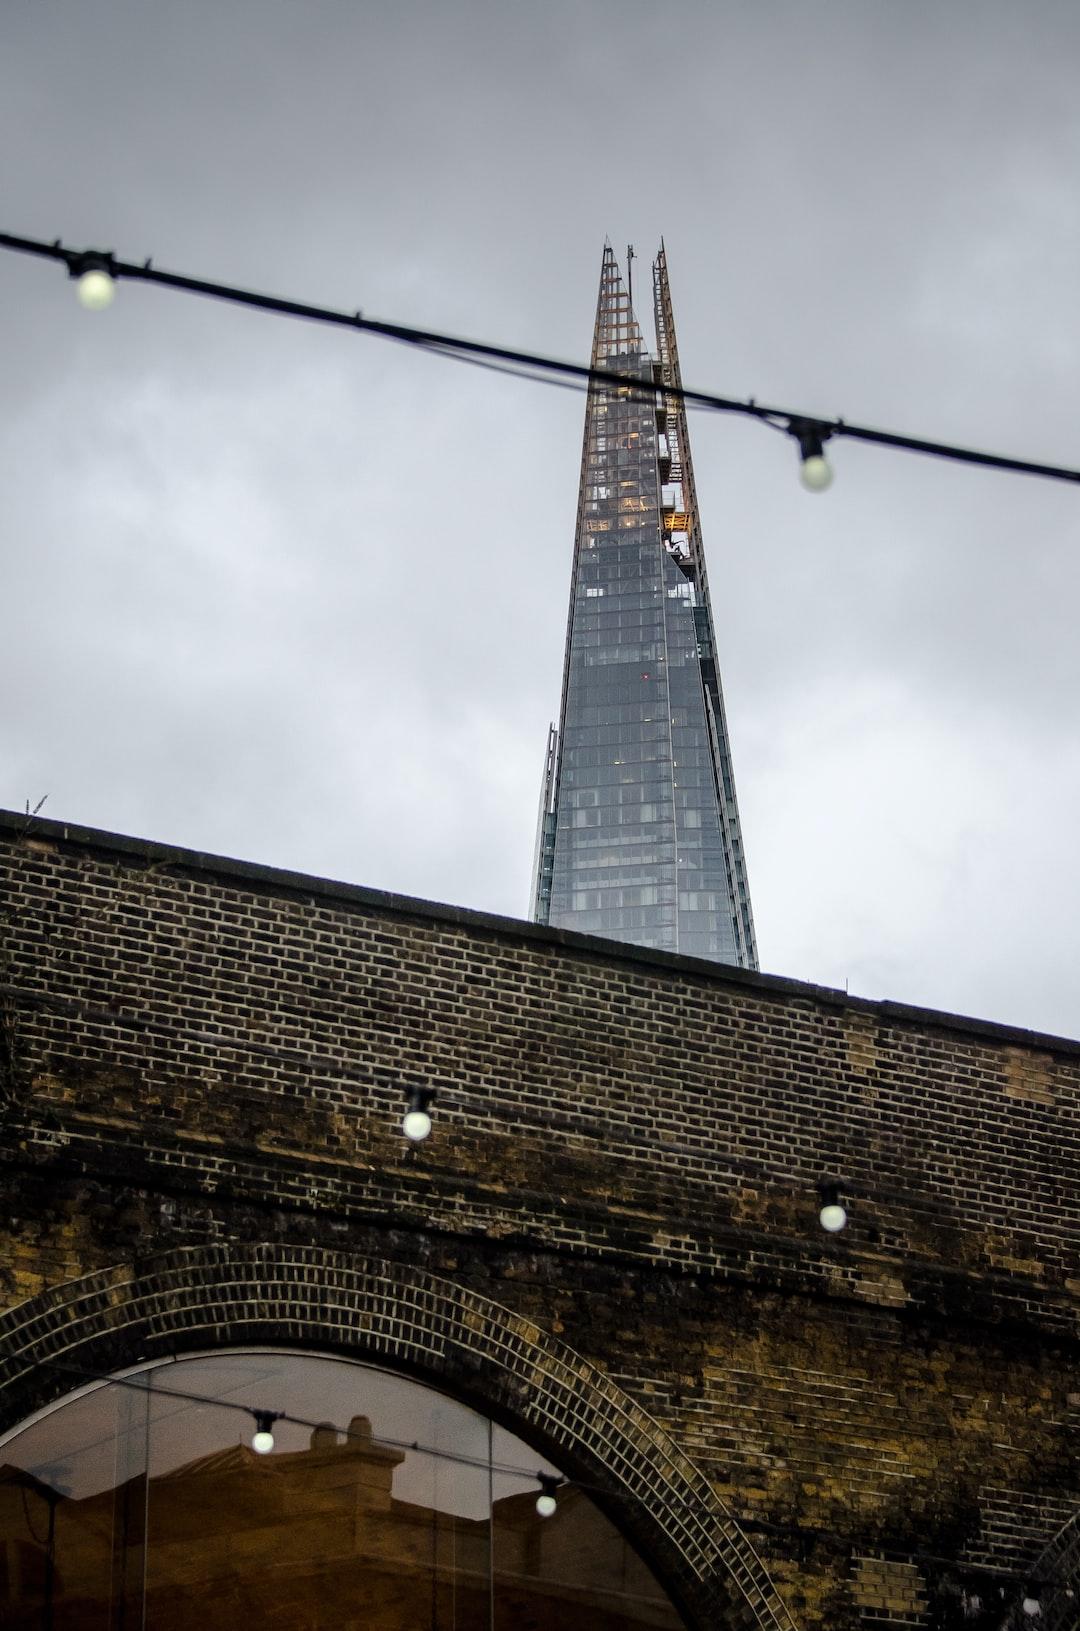 The Shard in London shot from a tube train